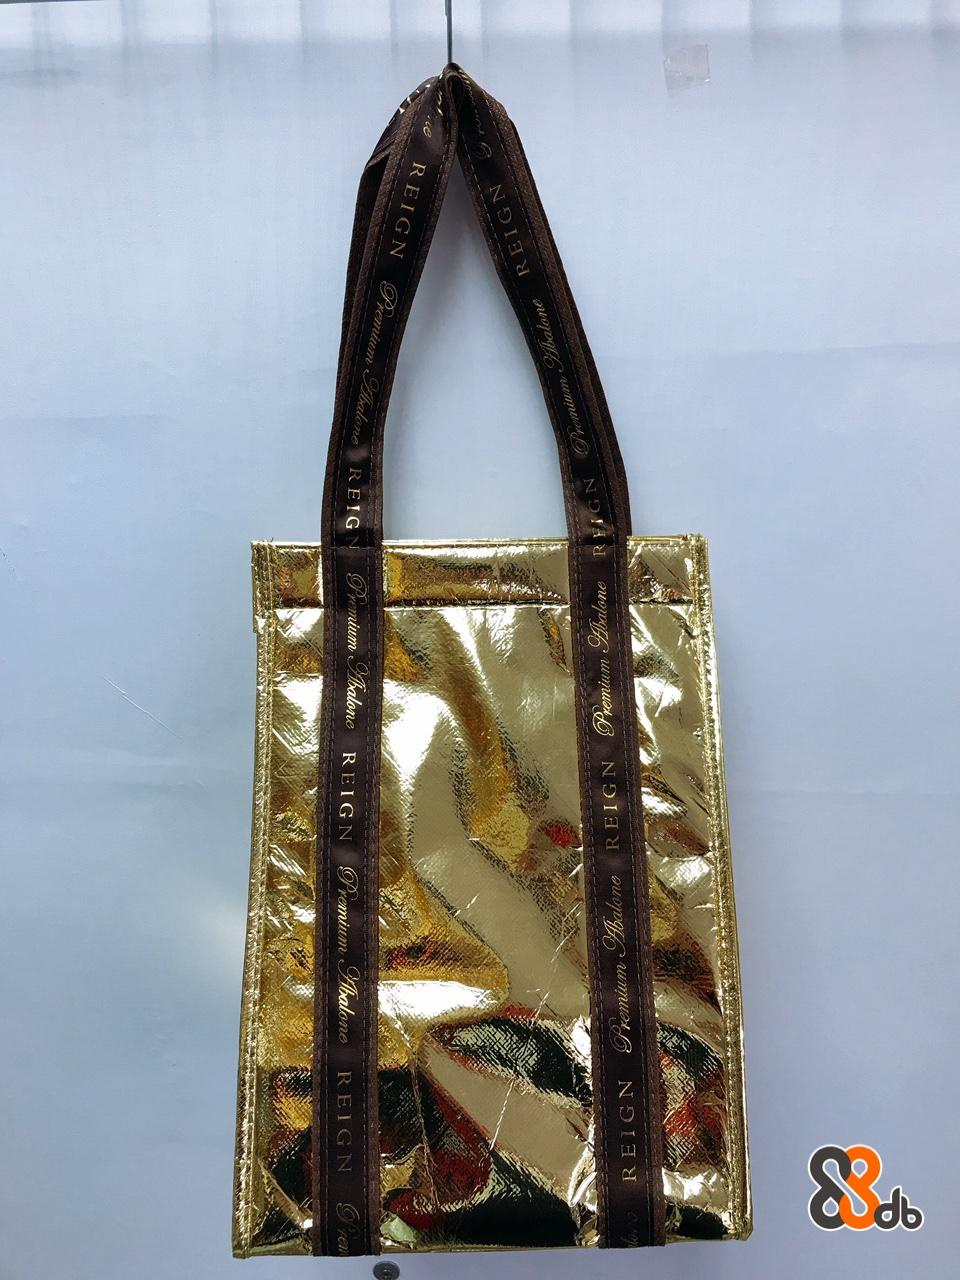 eR EIGN REIGN Premium  Bag,Handbag,Shoulder bag,Fashion accessory,Brown